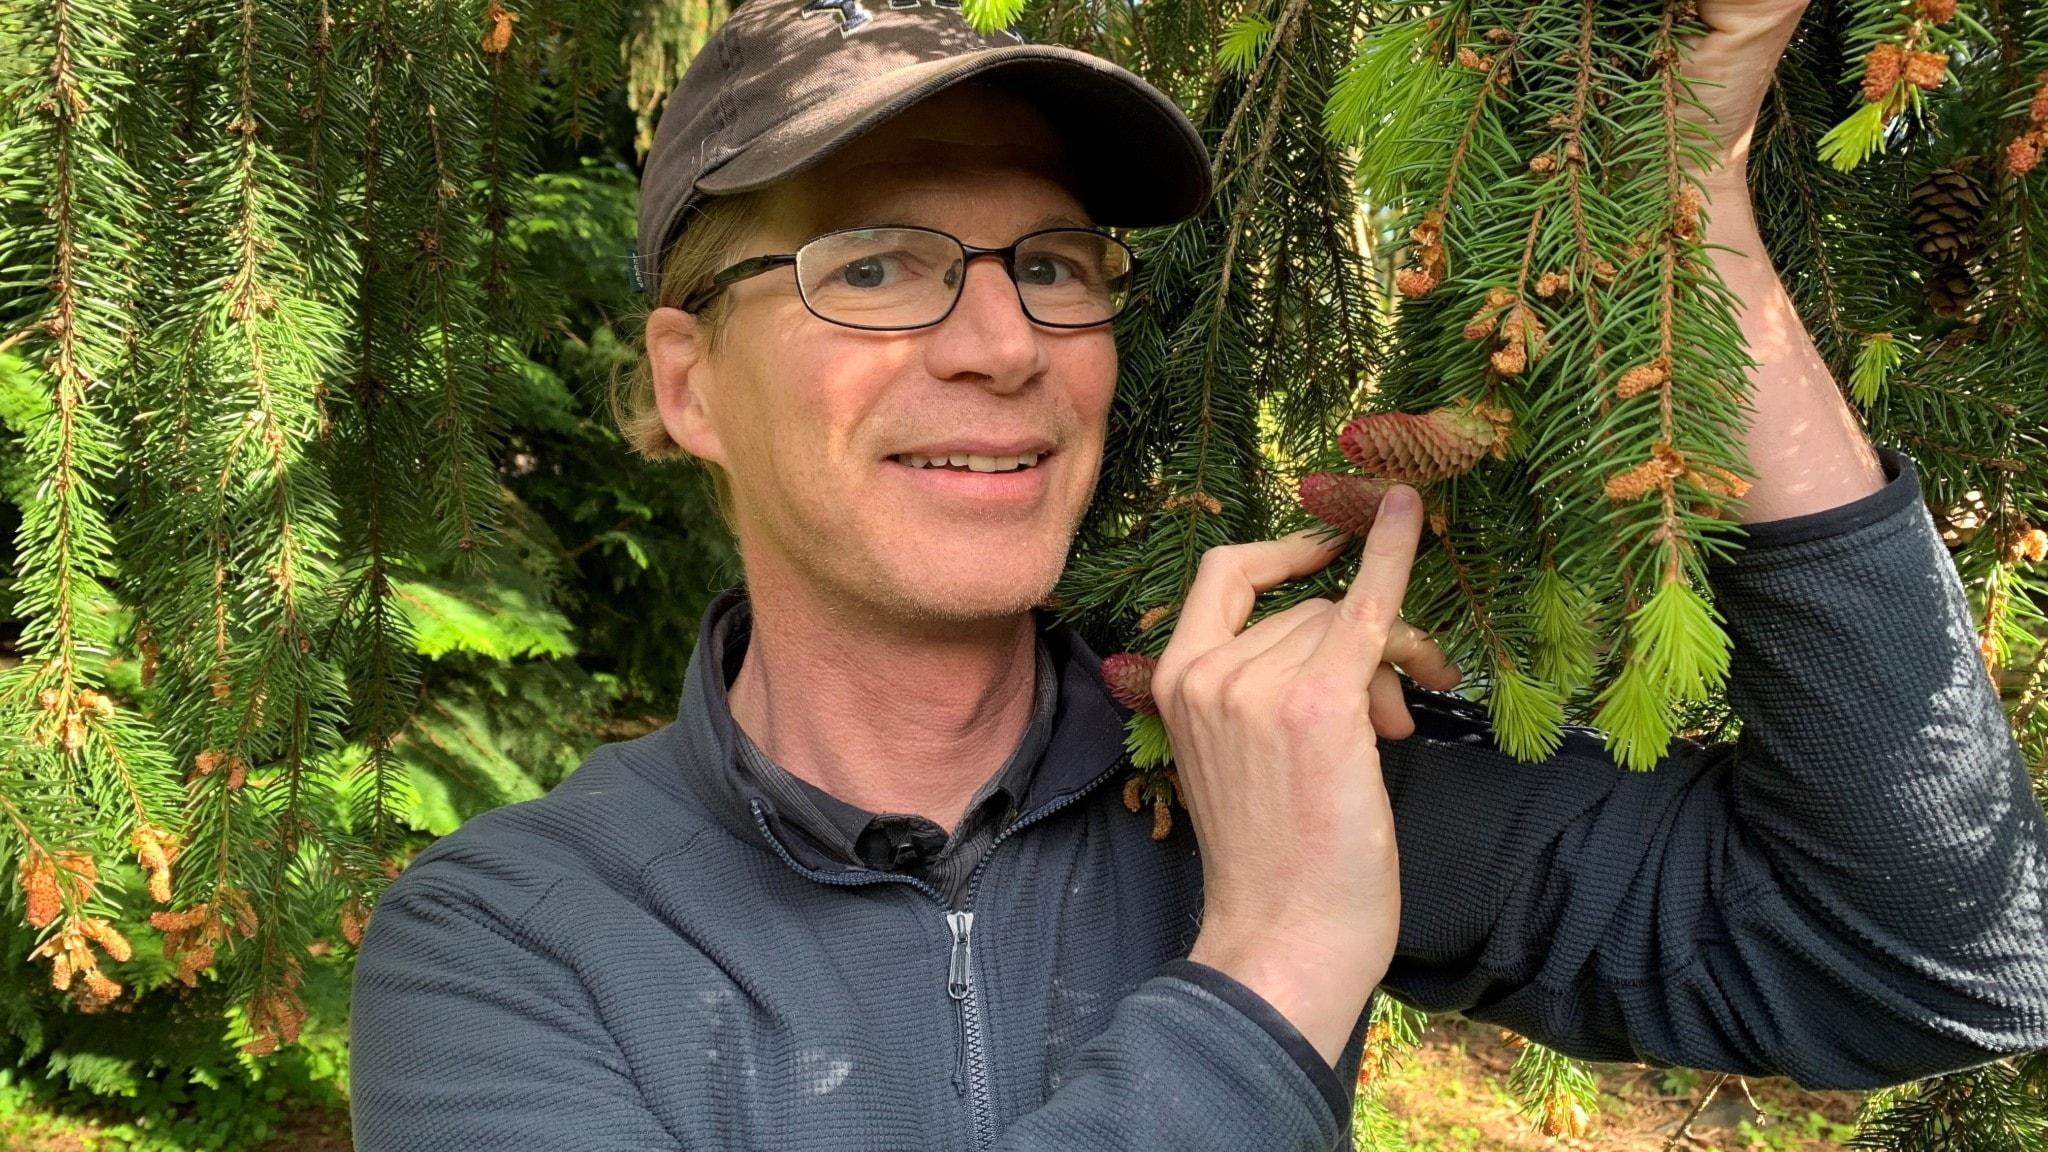 Jens Sundström är docent i växtfysiologi på Sveriges lantbruksuniversitet, SLU.